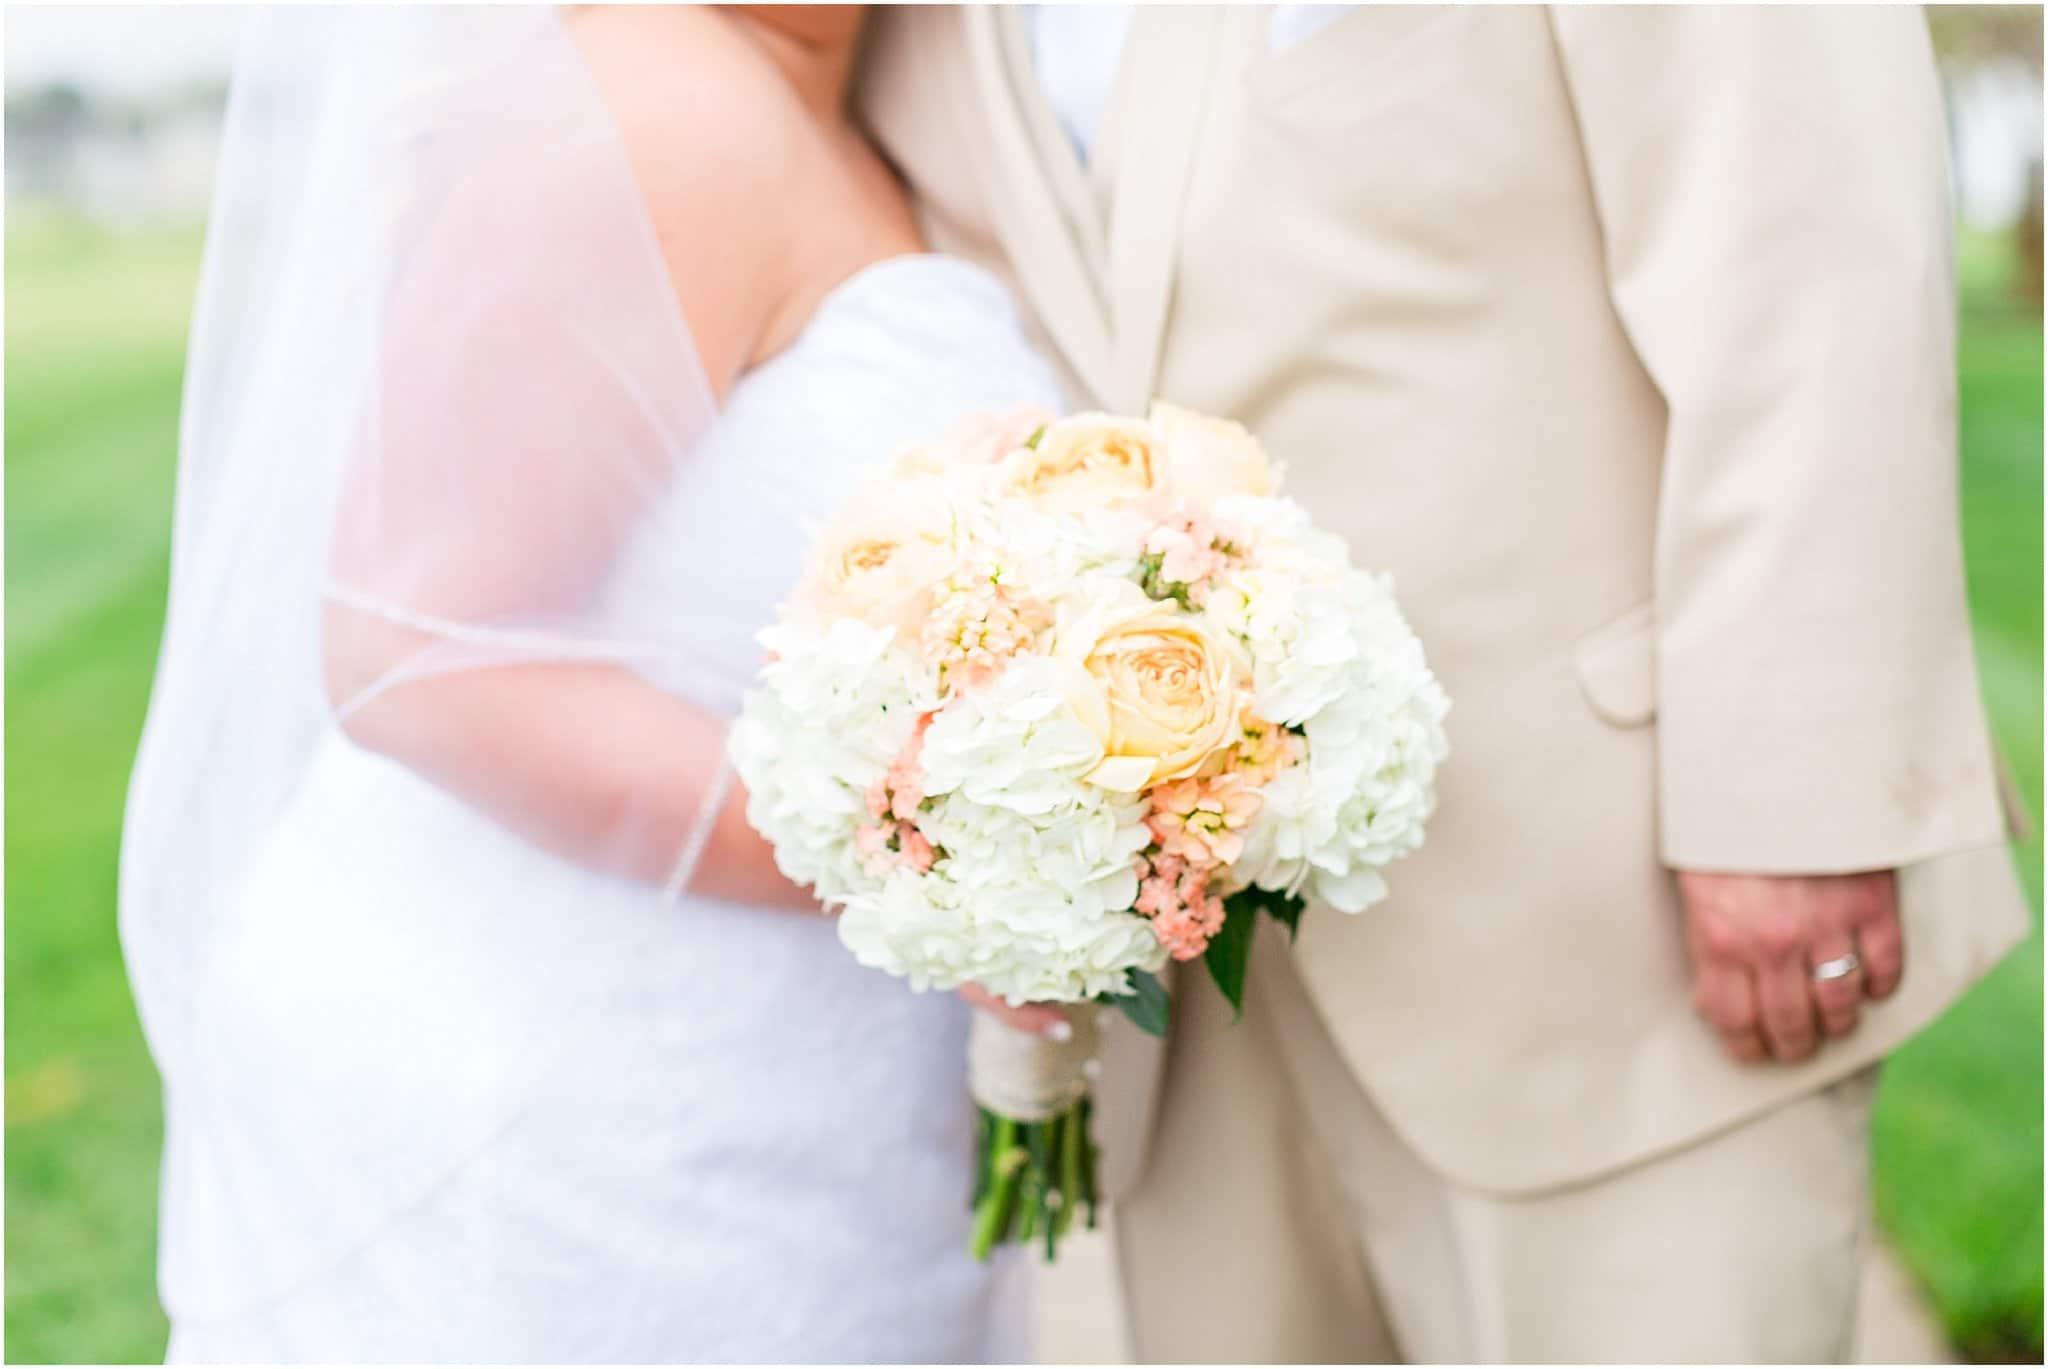 jessscott-milsboro-delaware-wedding-cassidymrphotography_0054